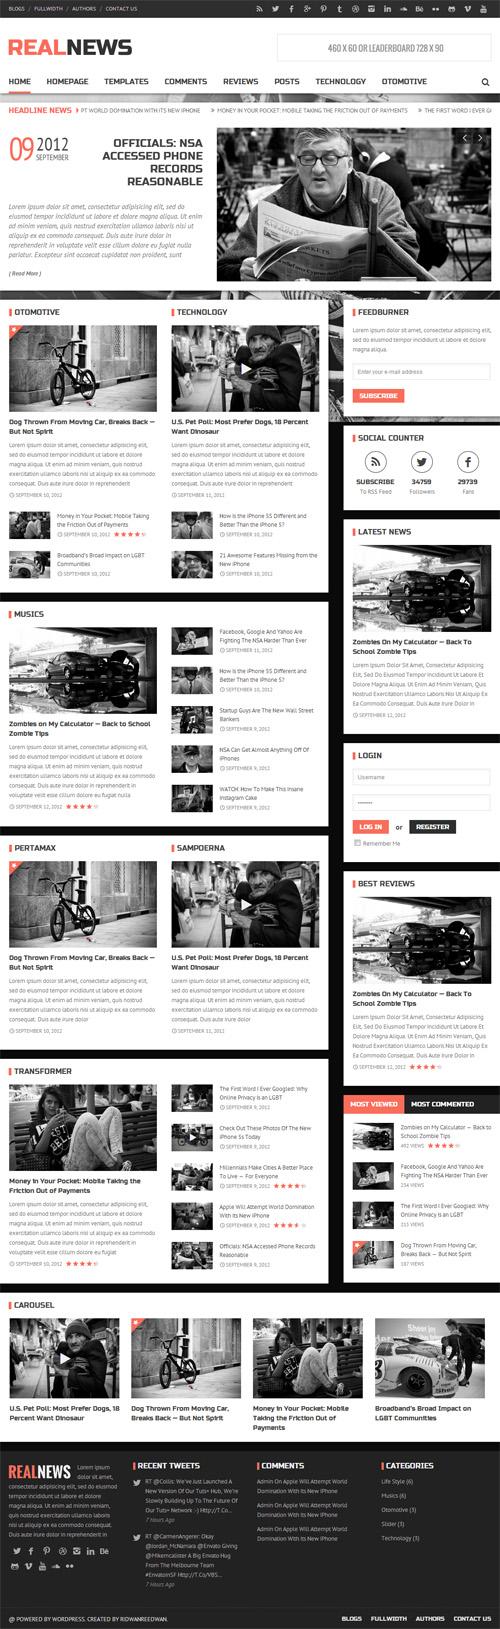 Realnews - Stylish and Responsive Magazine Theme